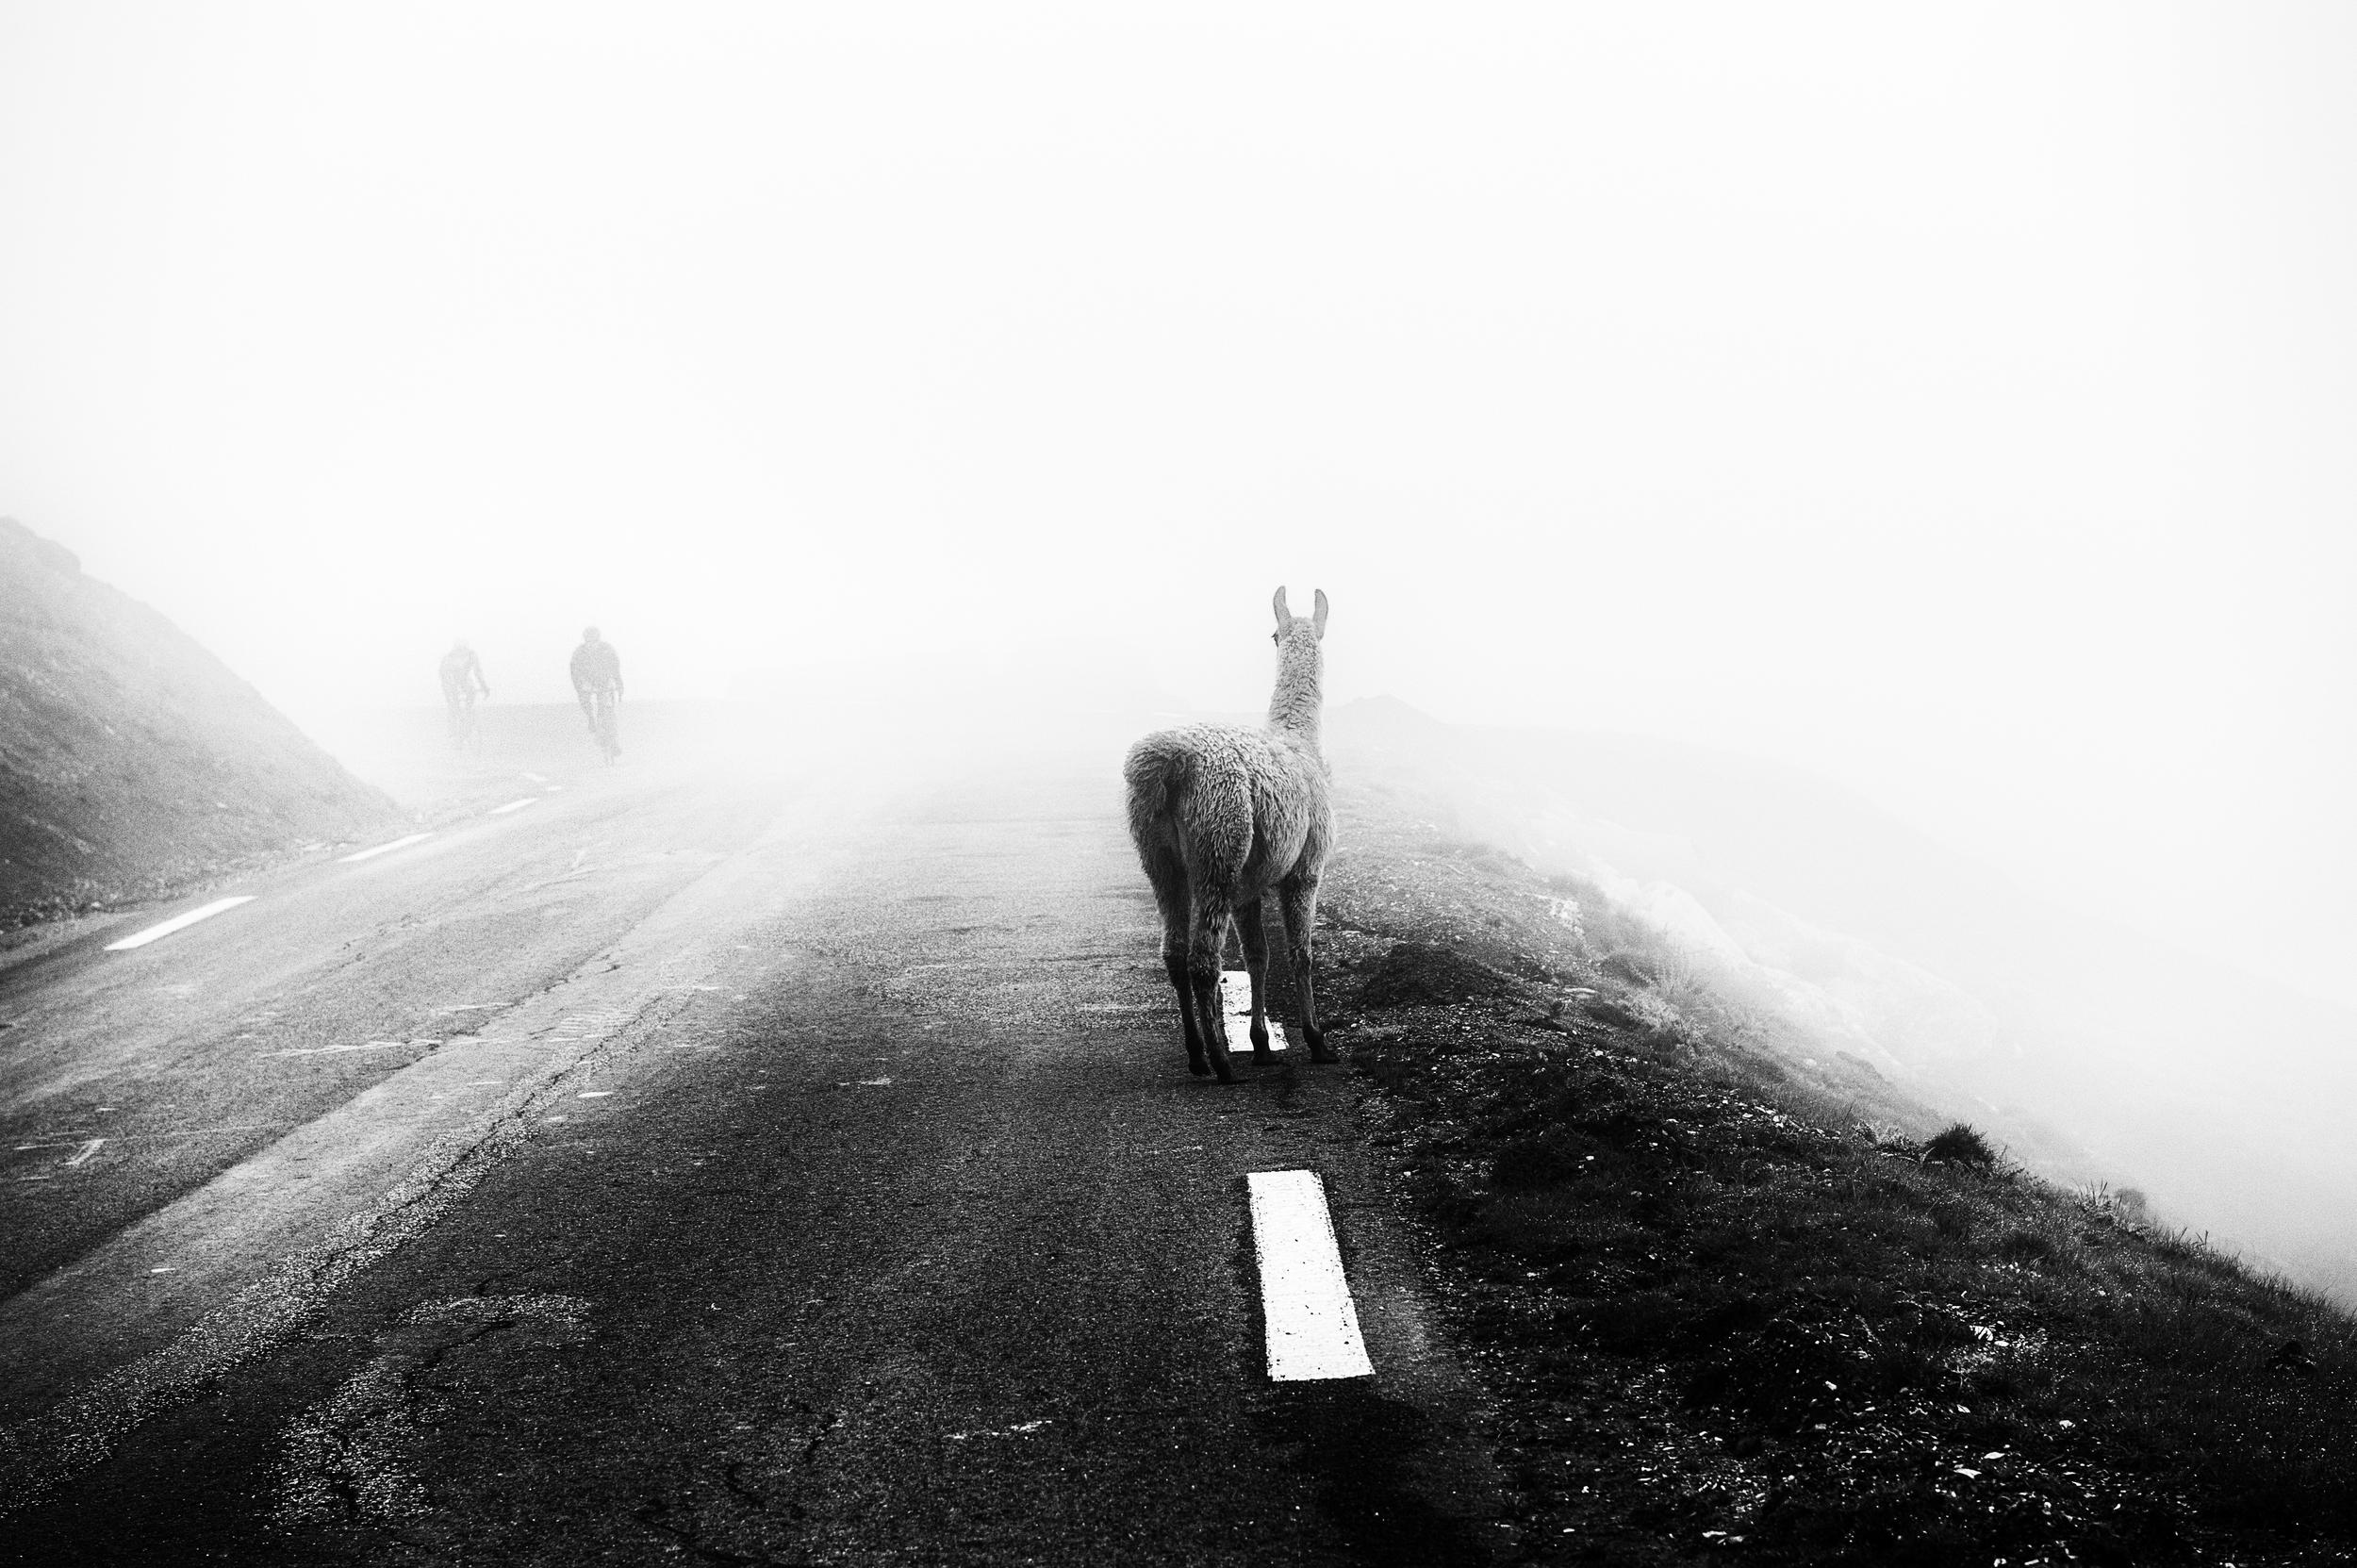 Col du Tourmalet check list:  Mist? Check. Cyclists? Check. No visibility? Check. Llama? Check.